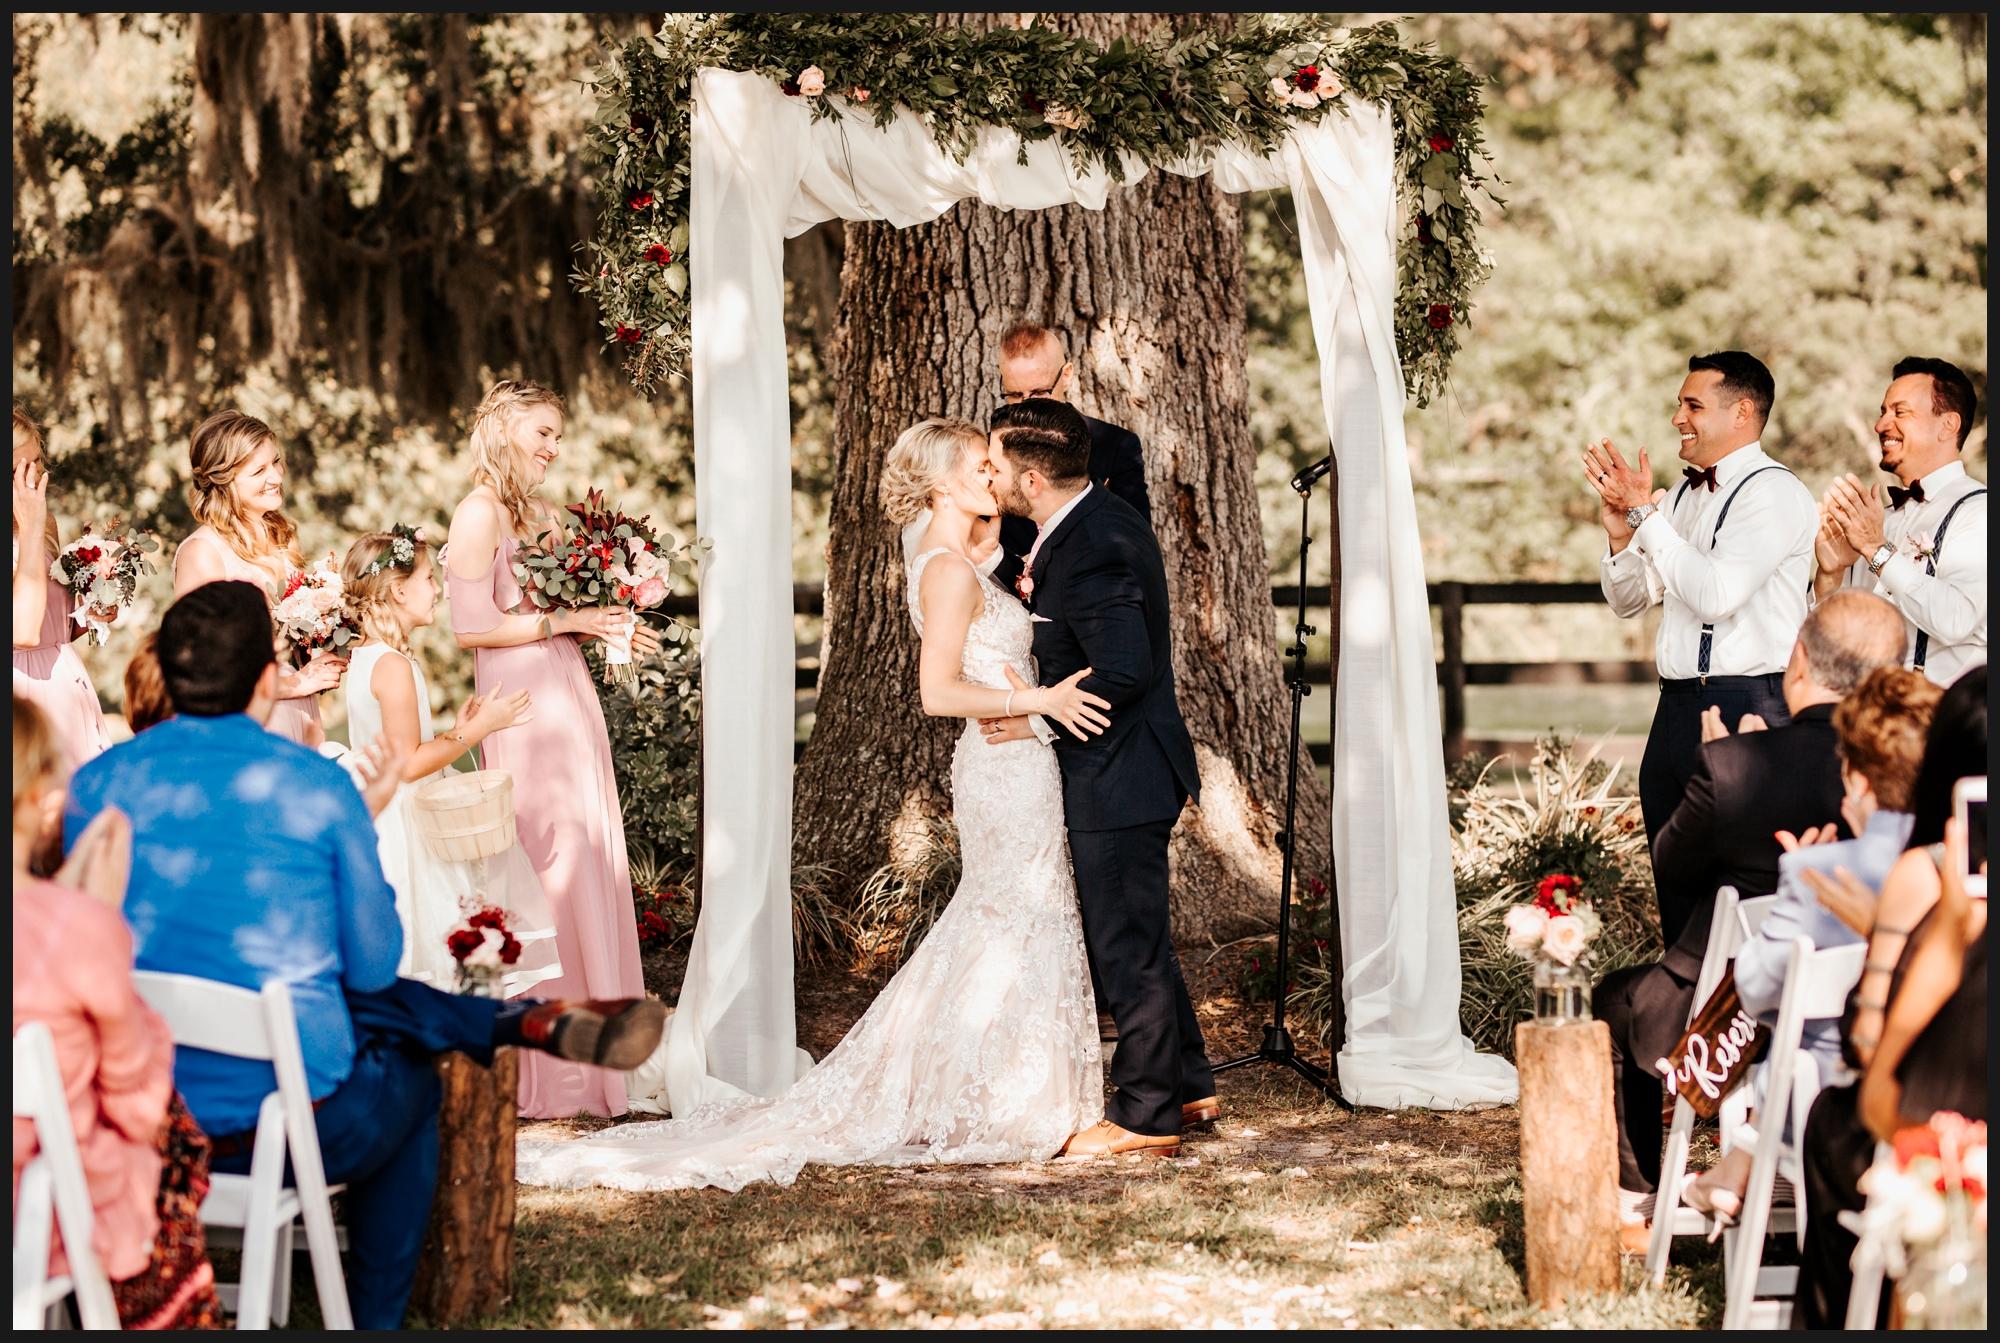 Orlando-Wedding-Photographer-destination-wedding-photographer-florida-wedding-photographer-hawaii-wedding-photographer_0598.jpg